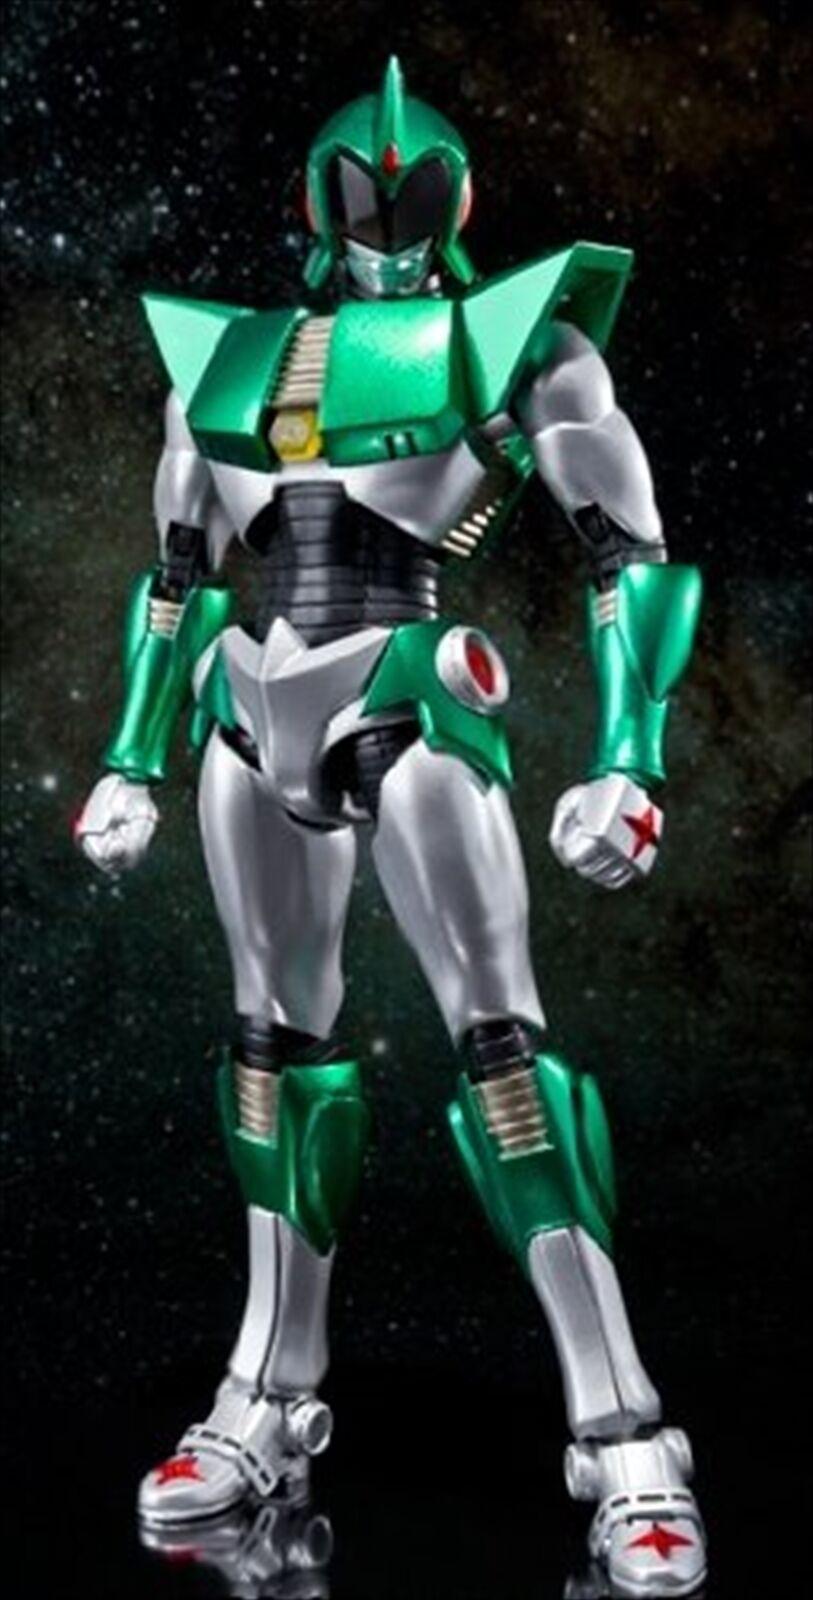 Bandai ULTRA-ACT Ultra Super Legend Andro Melos Action Figure Figure Figure dcea57